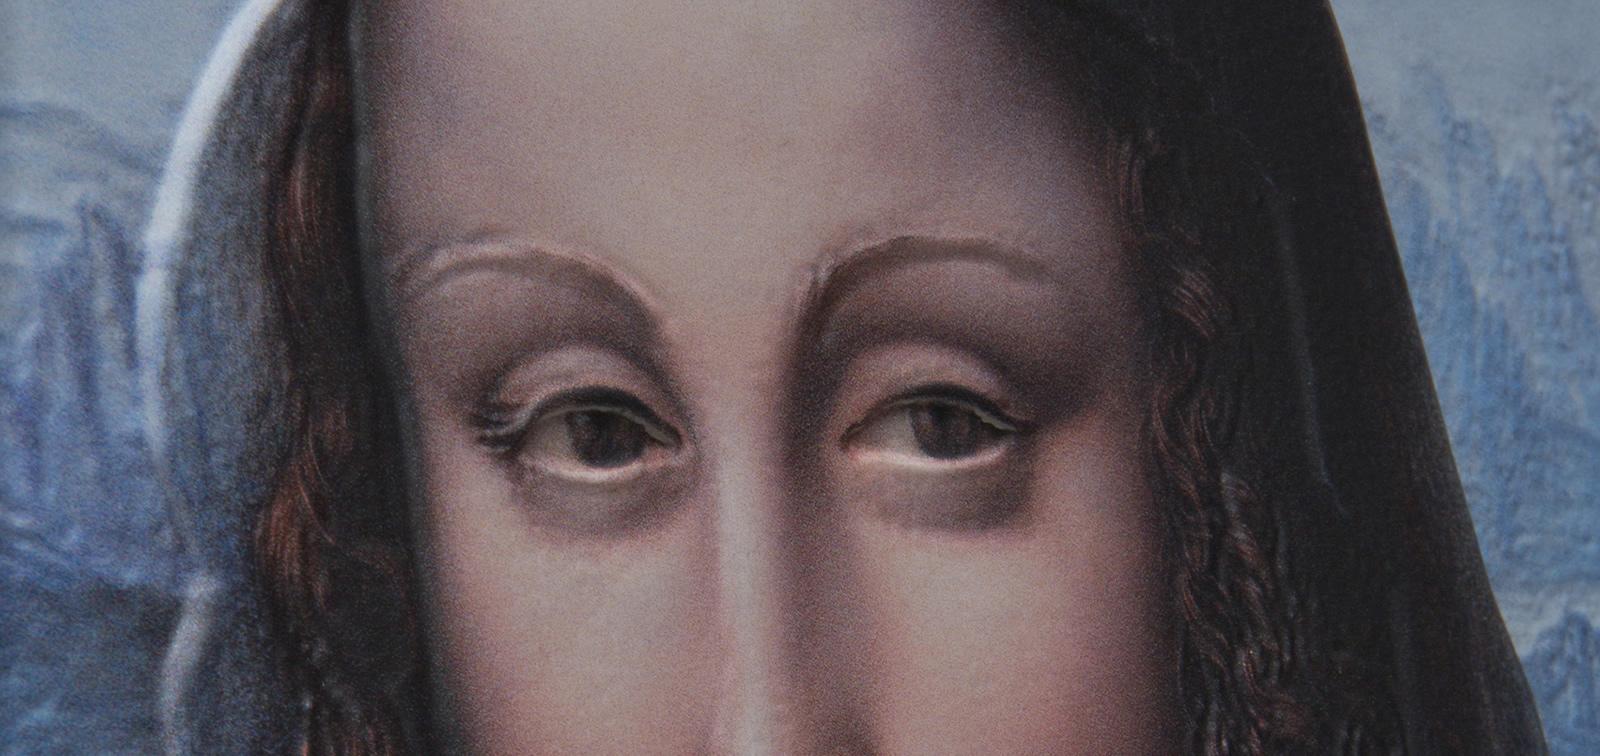 Hoy toca el Prado